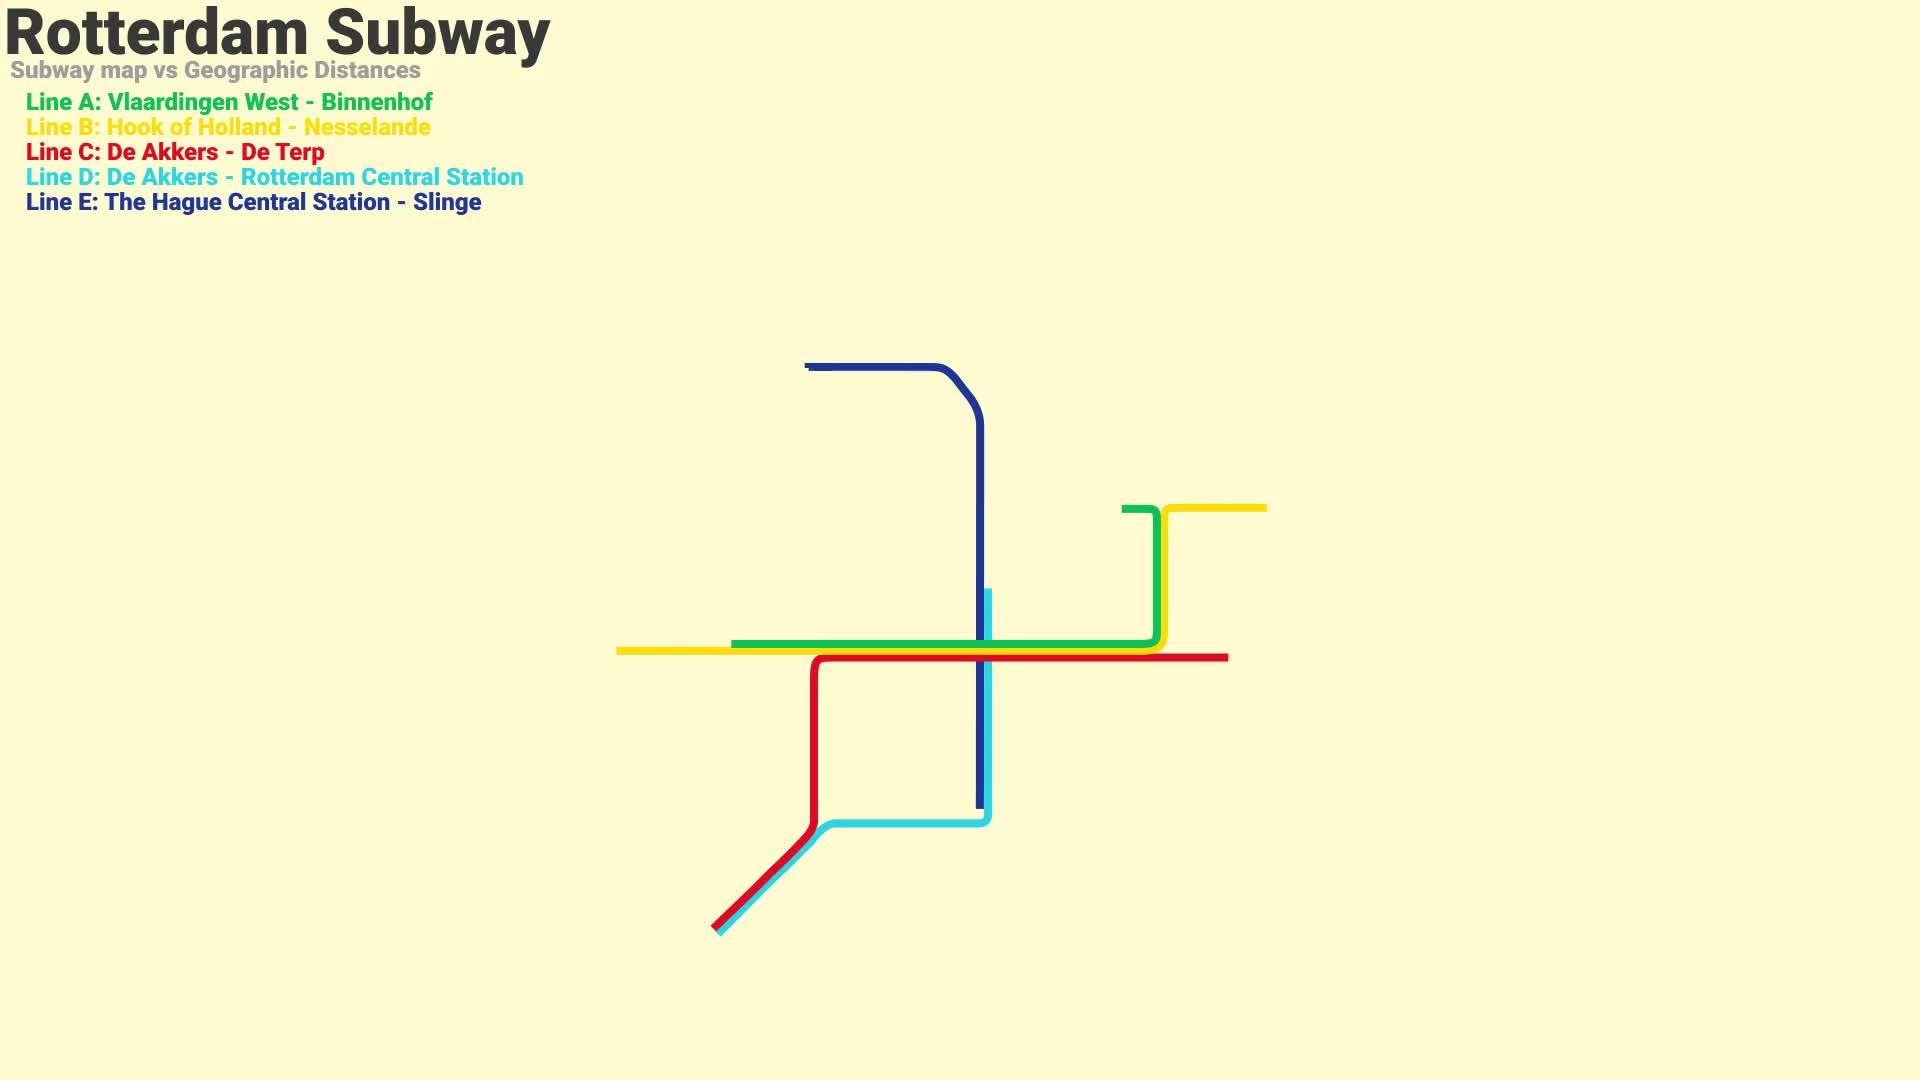 dataisbeautiful, Rotterdam Subway Map (September 2017) vs Geographic Distance GIFs